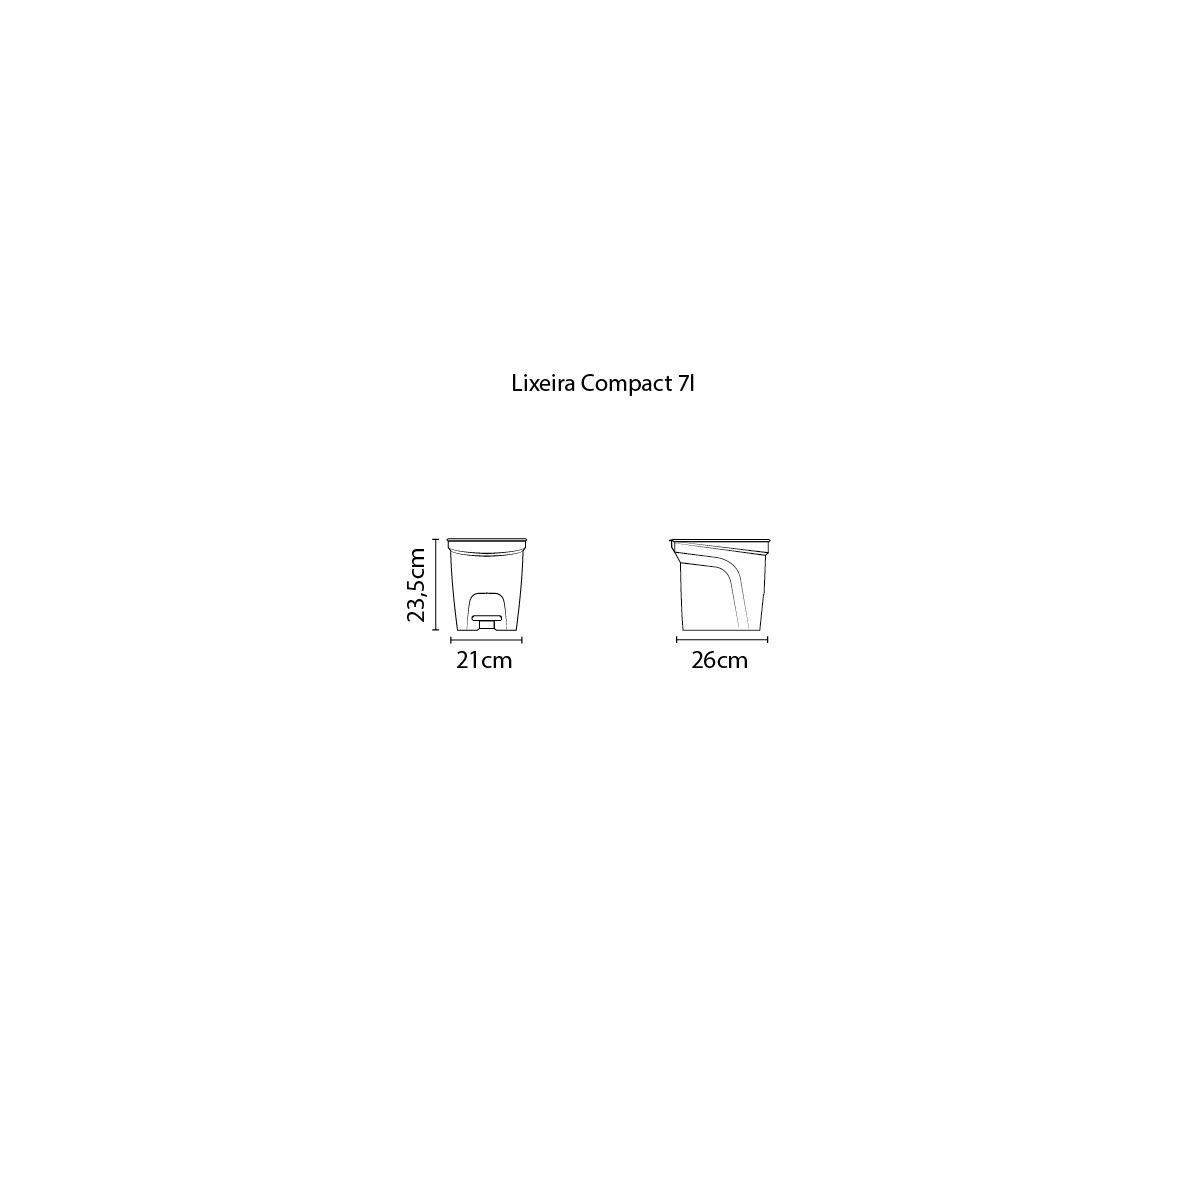 Lixeira Tramontina 7 Litros Compact em Polipropileno Branco